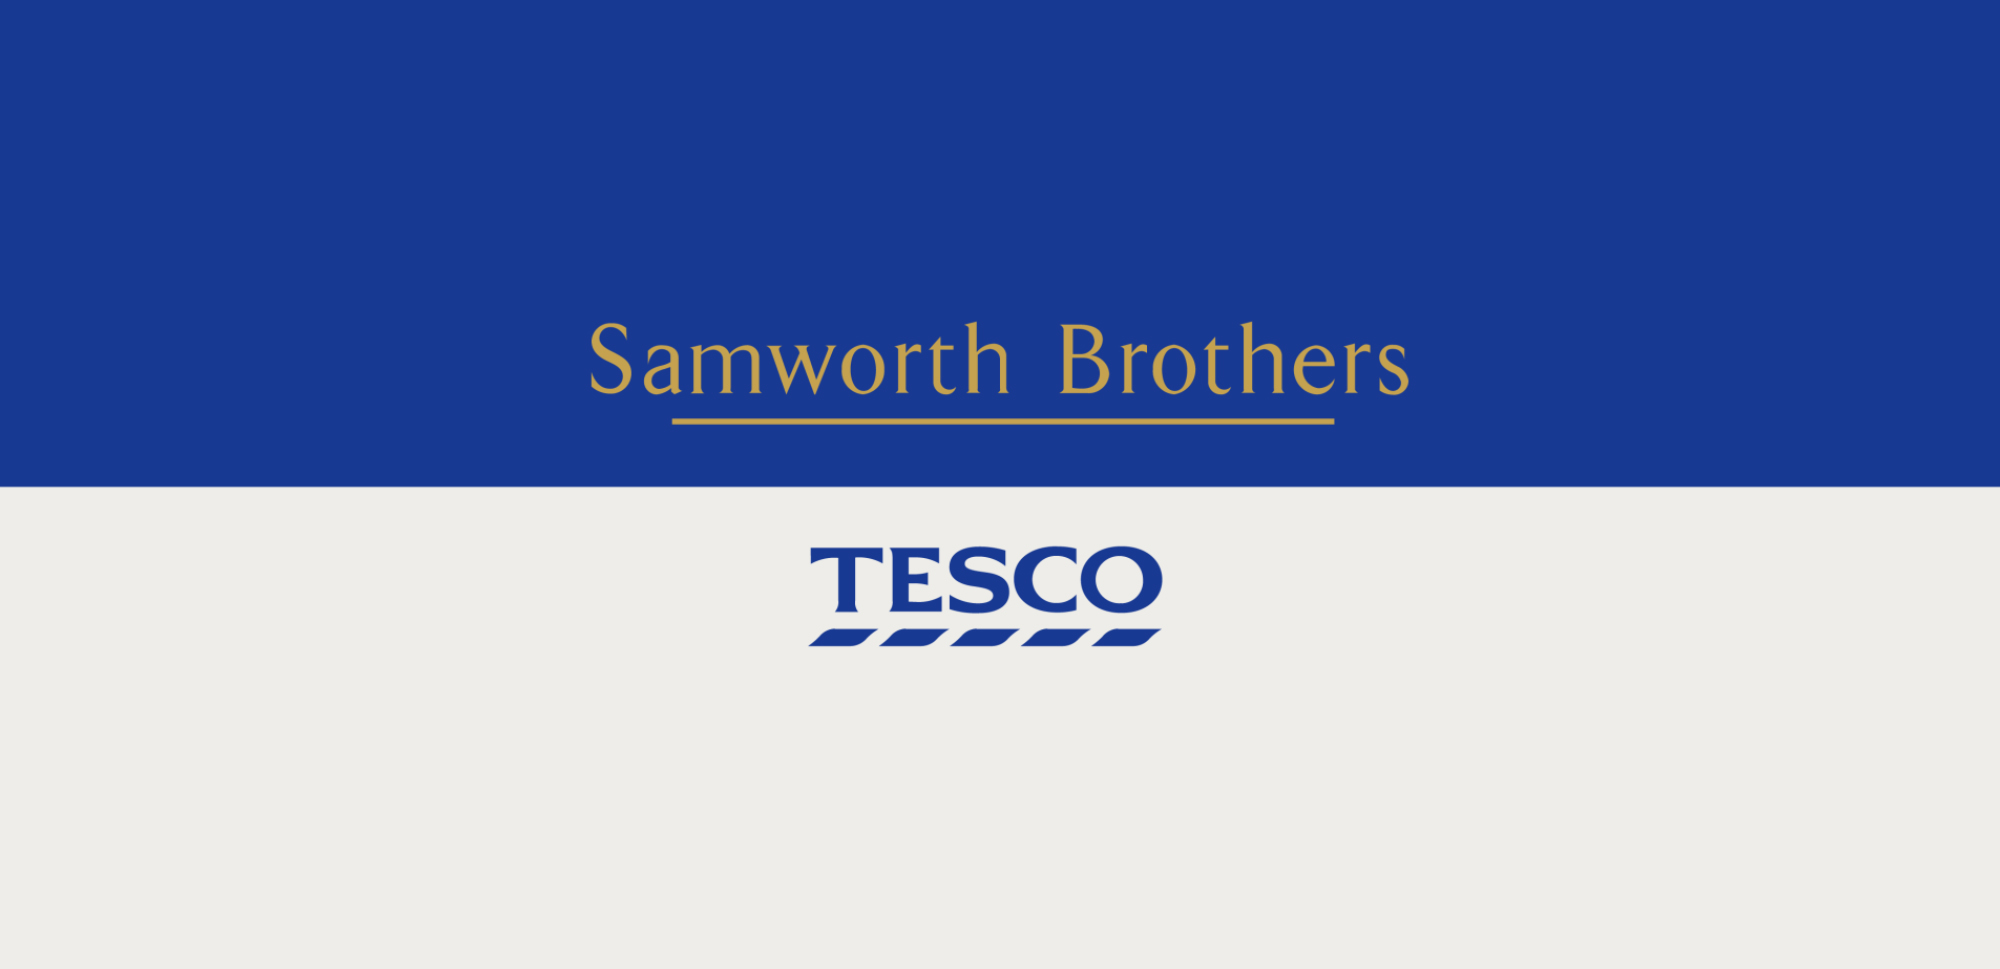 Samworth Brothers_Tesco identity